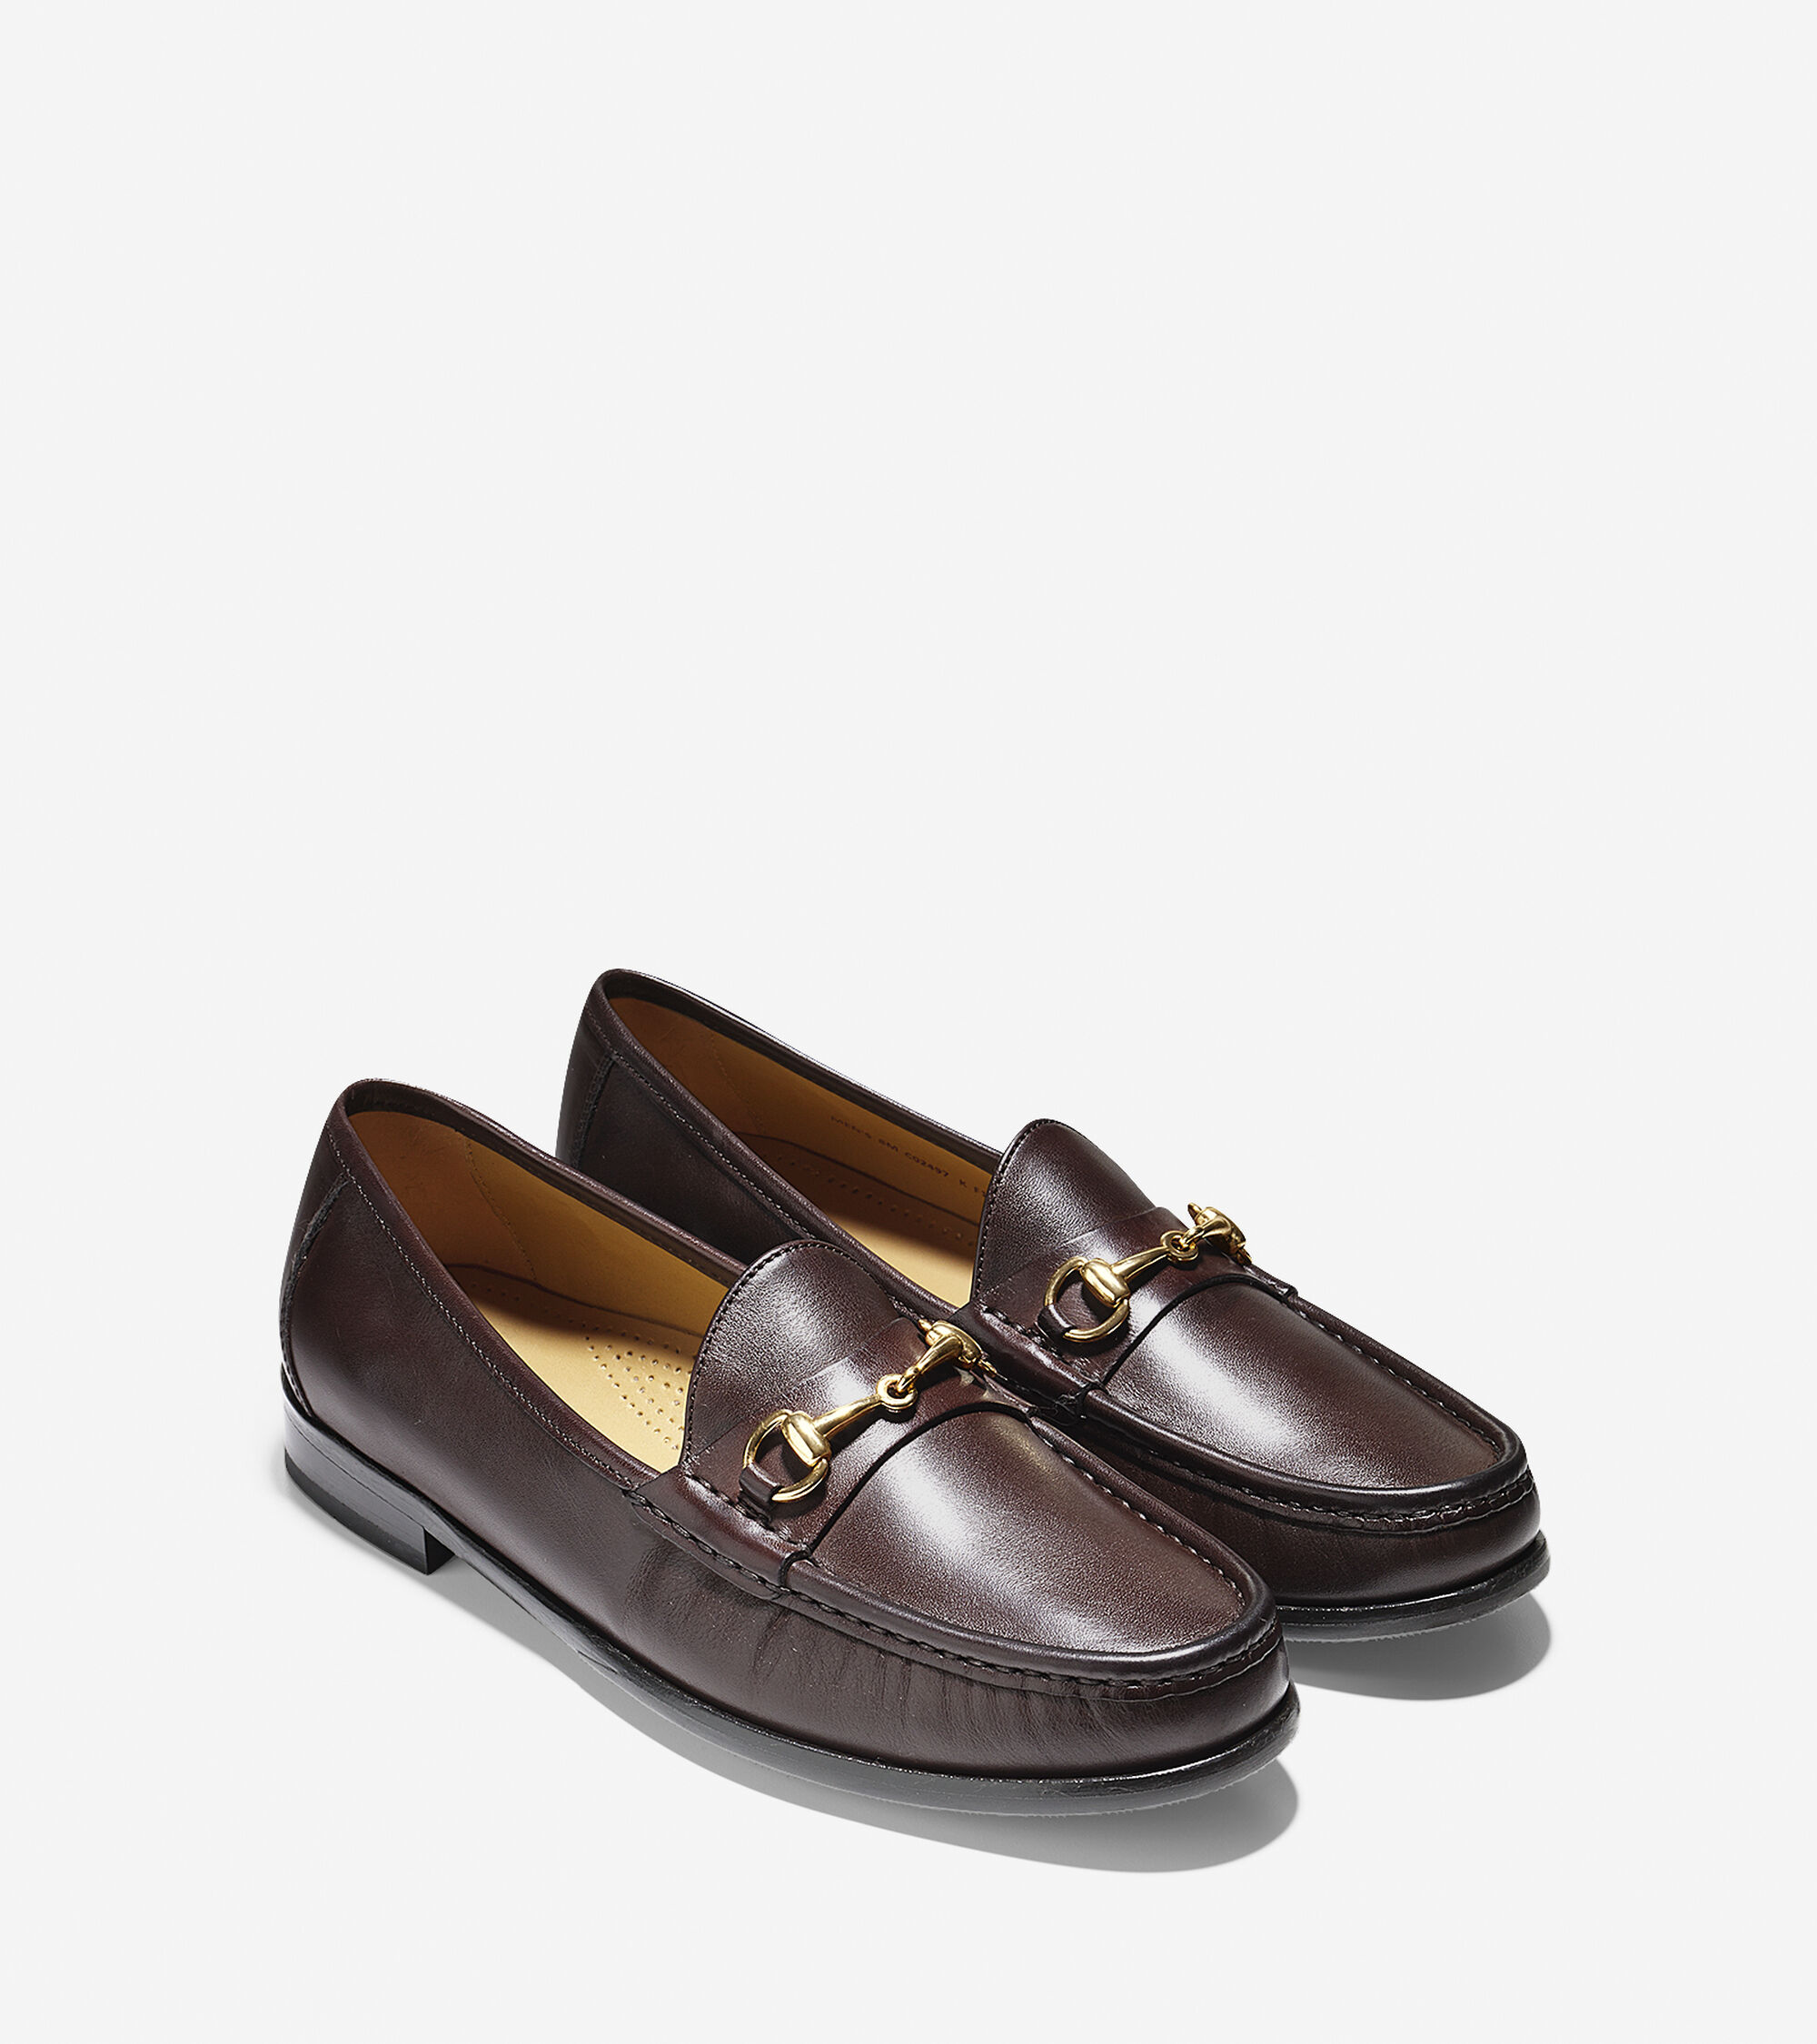 b984e4defc5 Men s Ascot Bit Loafers in Dark Brown   Sale